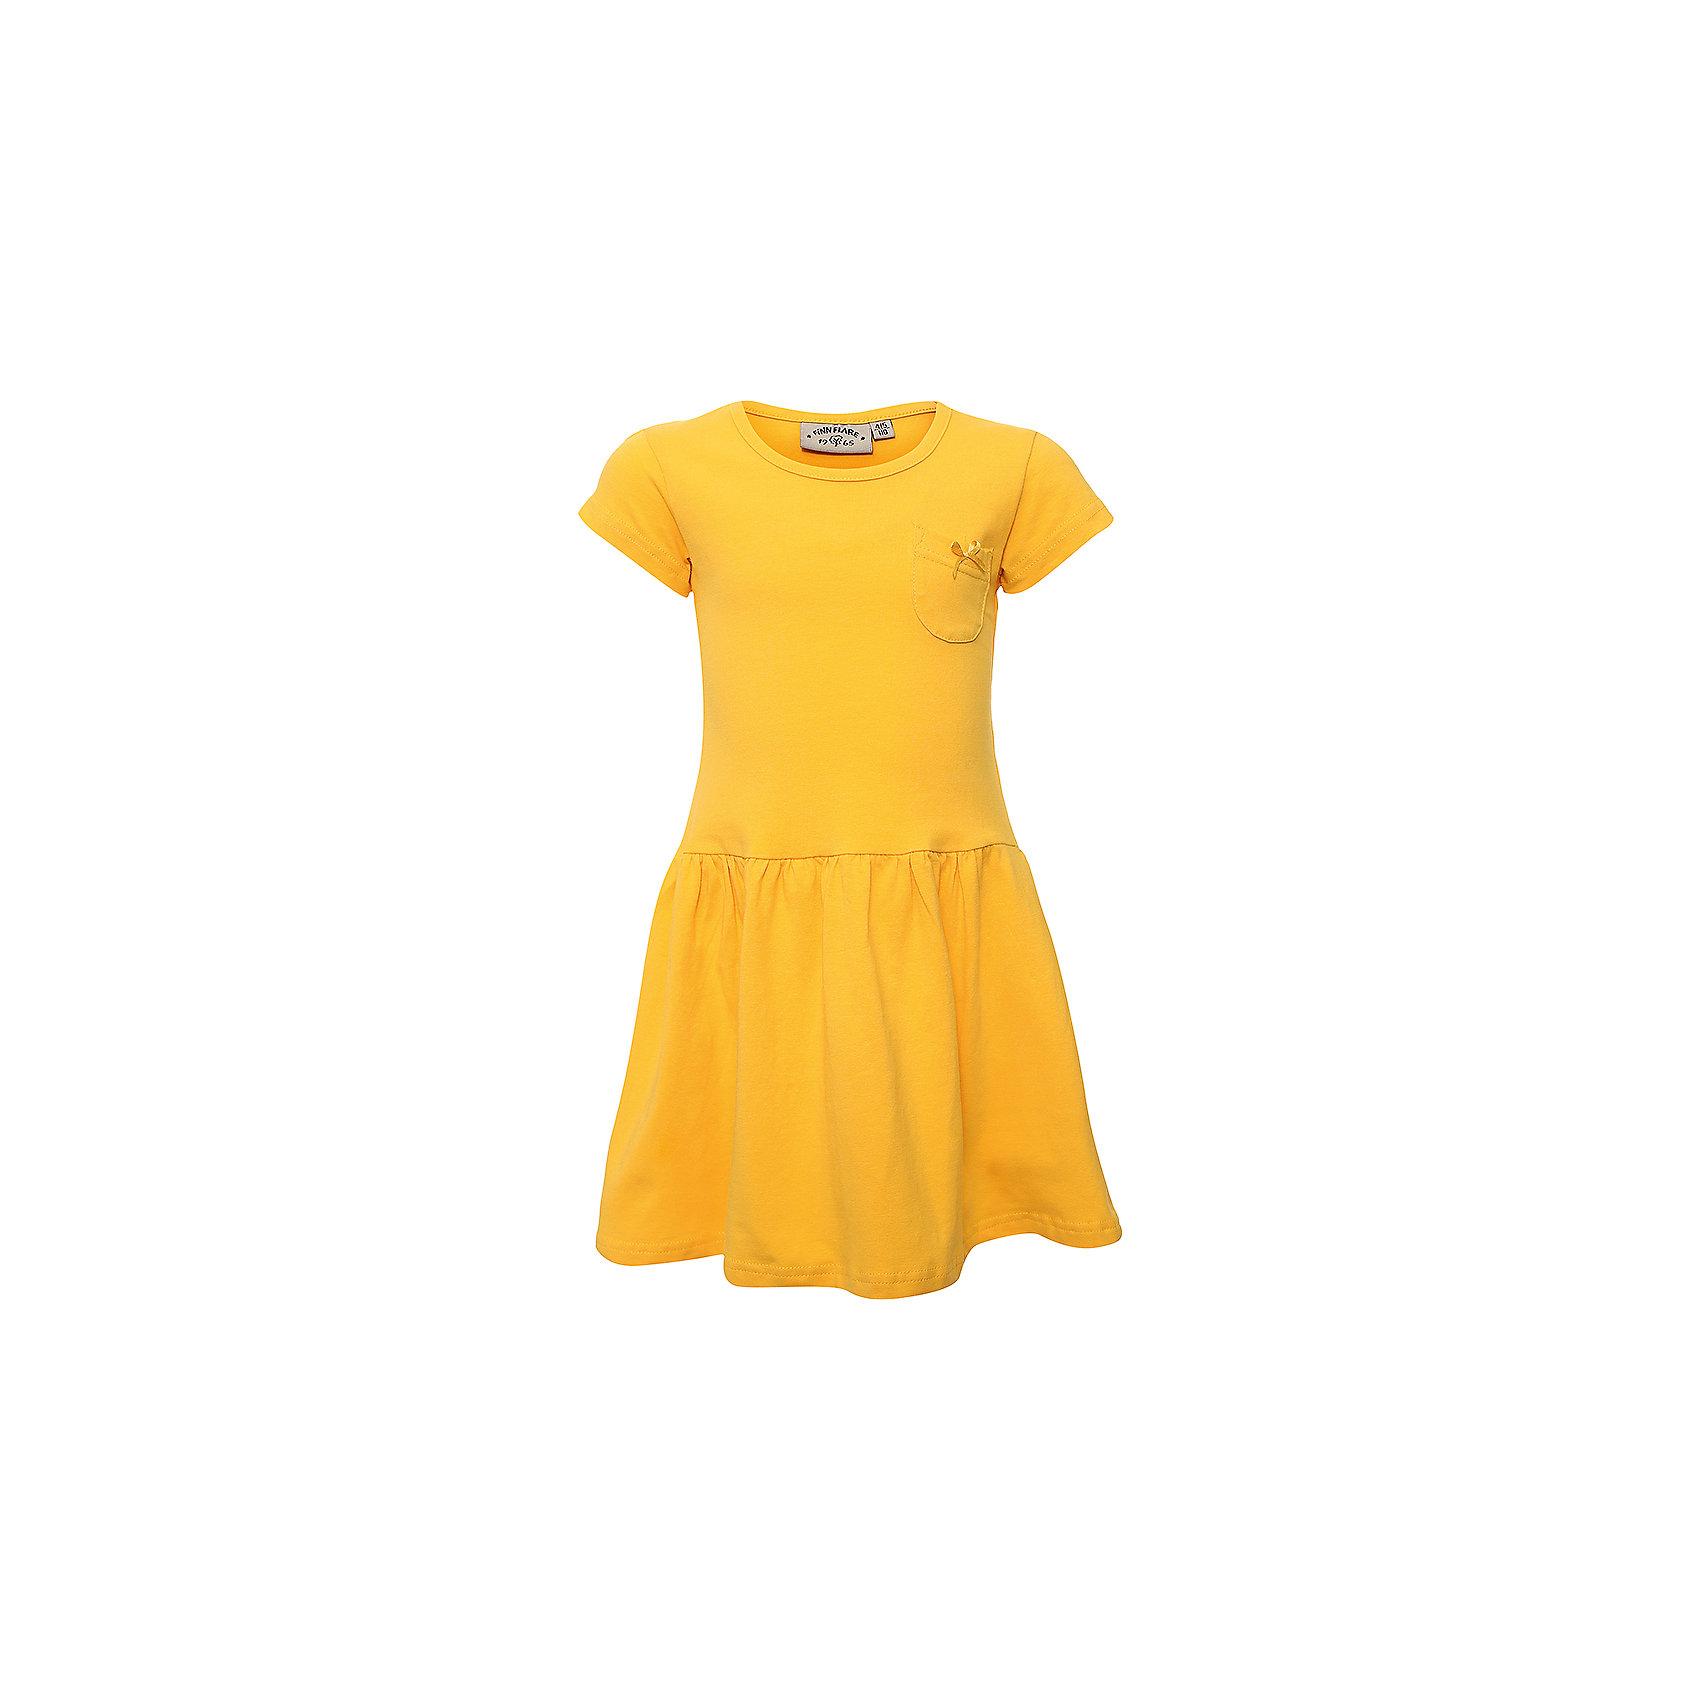 Платье для девочки Finn FlareПлатье для девочки от известного бренда Finn Flare<br>Фактура материала:Трикотажный<br>Вид застежки:Без застежки<br> Длина рукава:Короткие<br> Тип карманов:Накладные<br>Состав:<br>95% хлопок, 5% эластан<br><br>Ширина мм: 236<br>Глубина мм: 16<br>Высота мм: 184<br>Вес г: 177<br>Цвет: желтый<br>Возраст от месяцев: 72<br>Возраст до месяцев: 84<br>Пол: Женский<br>Возраст: Детский<br>Размер: 122,110<br>SKU: 4835486